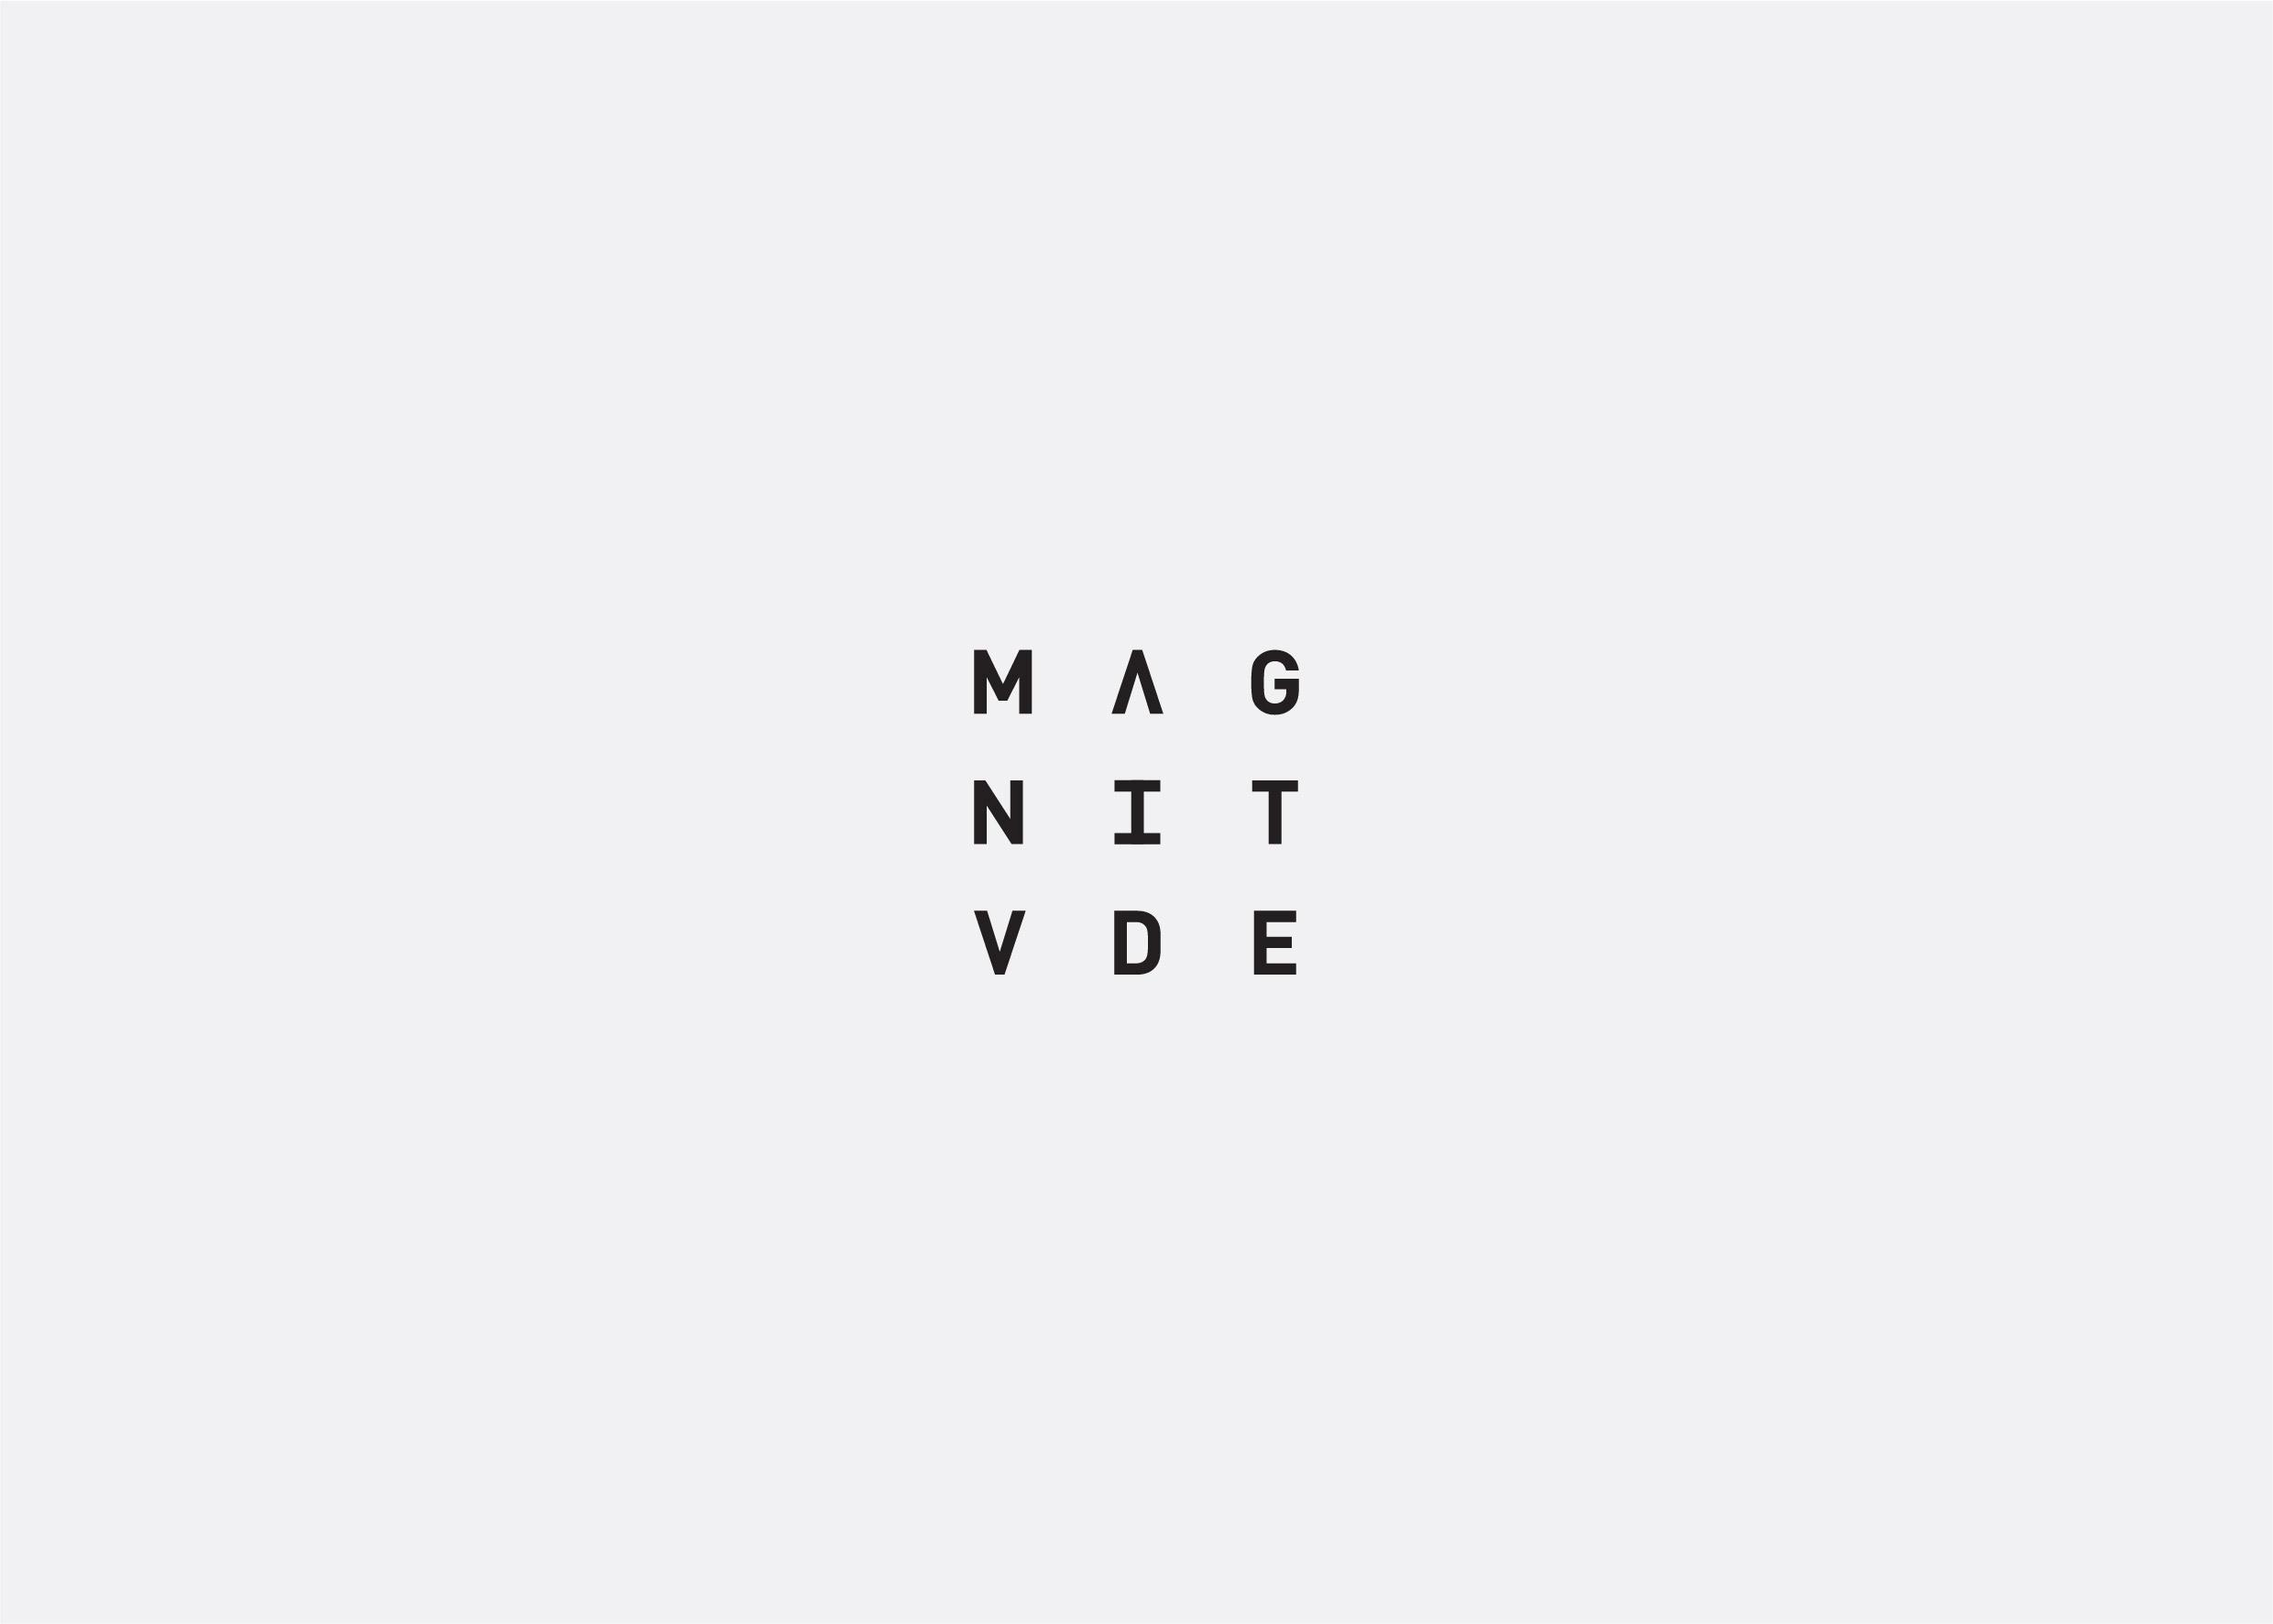 ↗ Magnitvde   #Engineering